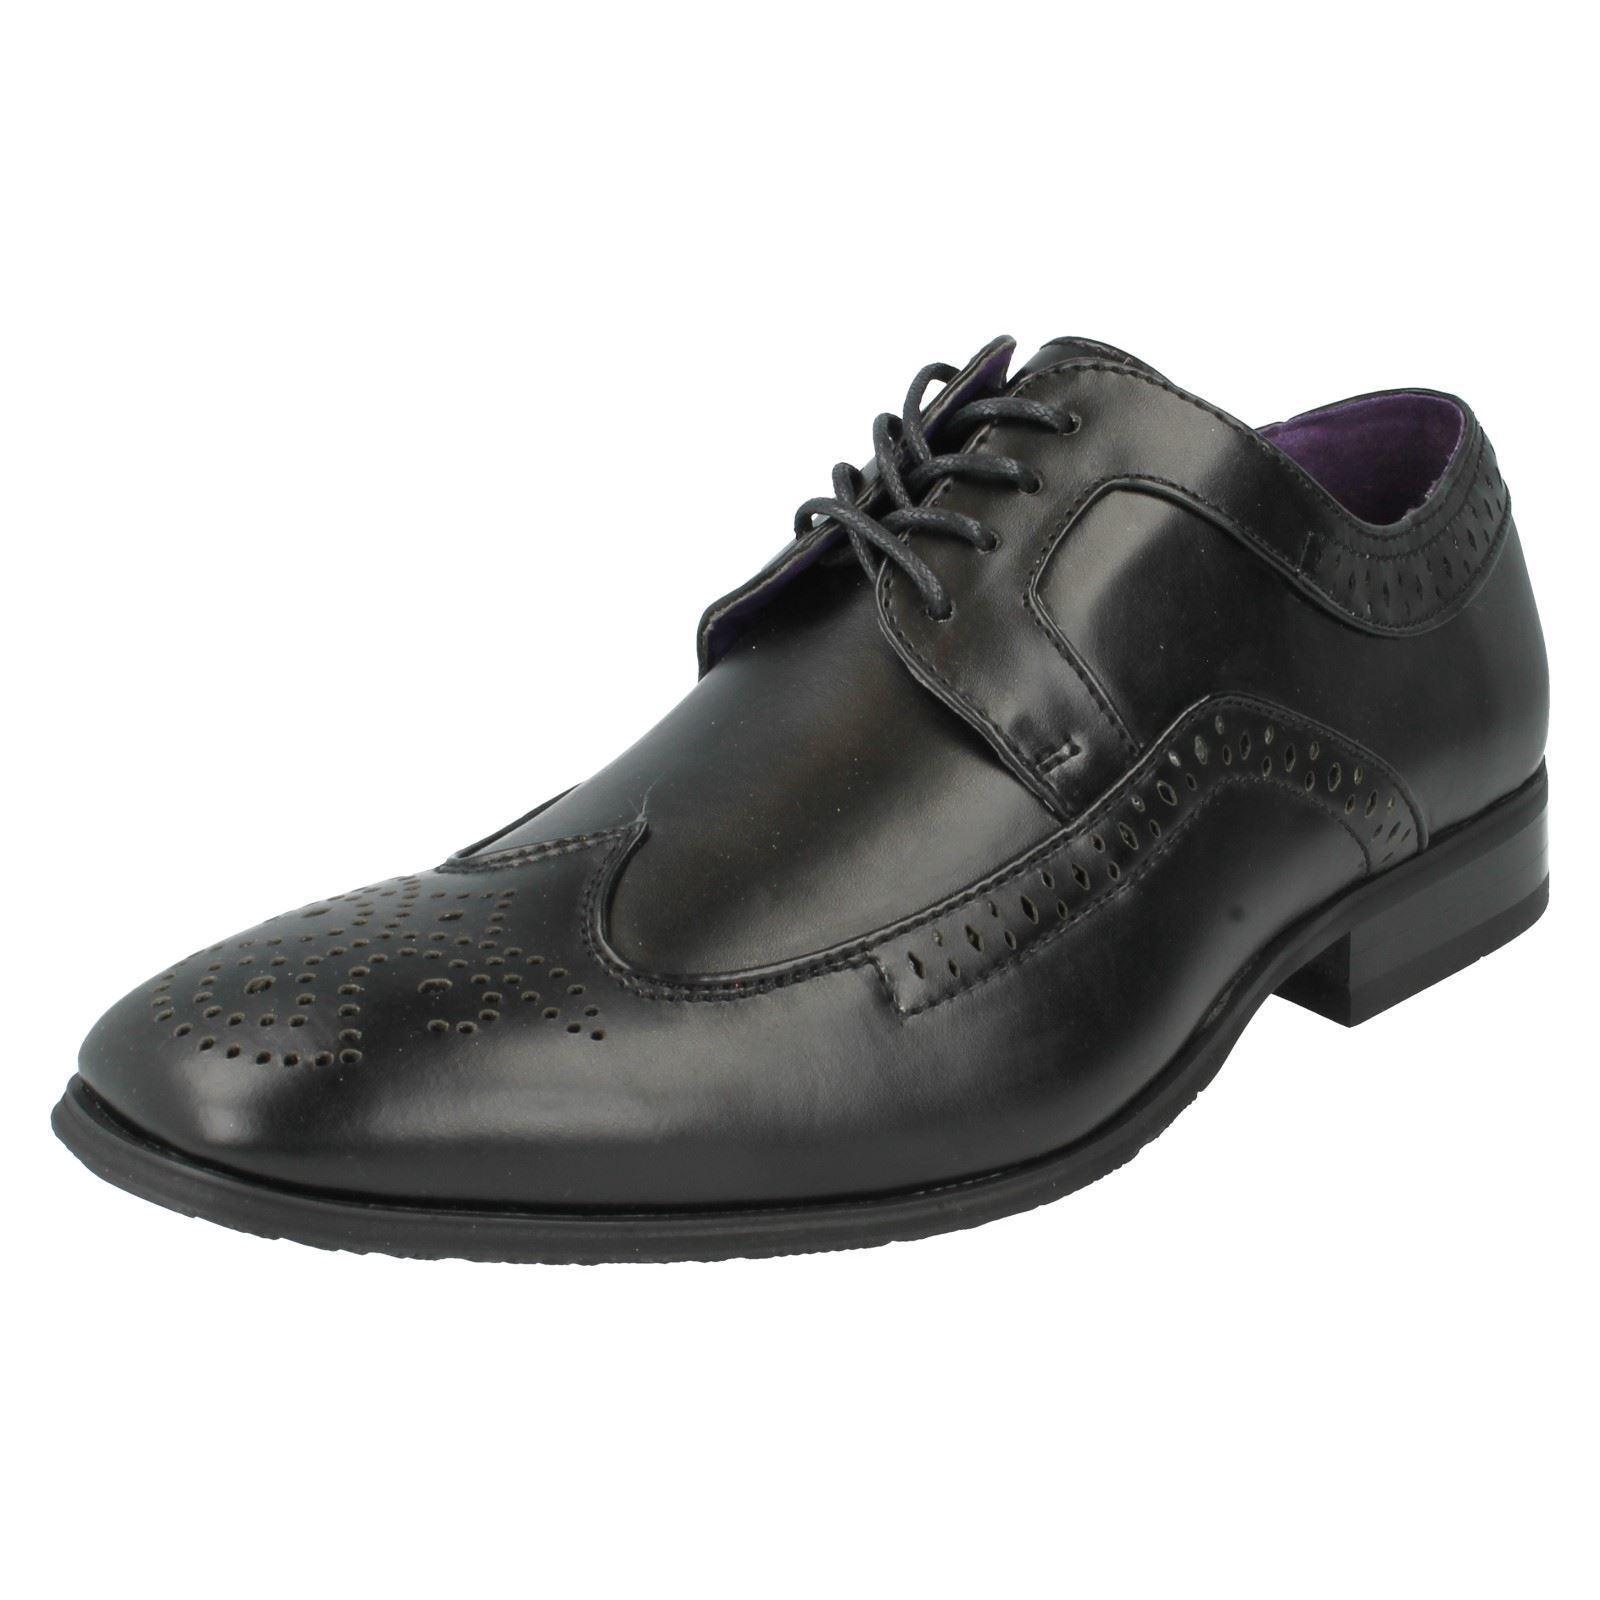 Hombre MAVERICK Negro Zapatos 7-11 Con Cordones GB Tallas 7-11 Zapatos a2071 281b6f